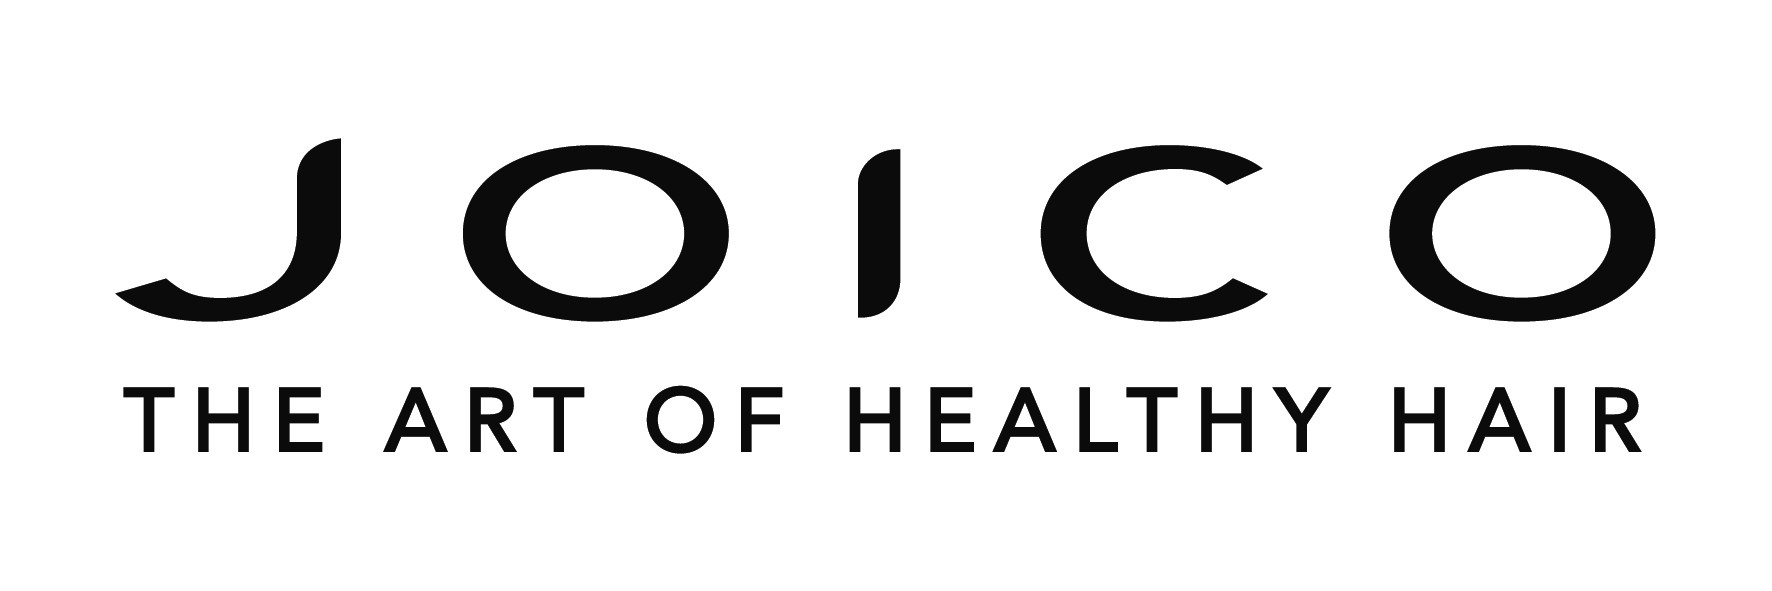 joico_logo.jpg